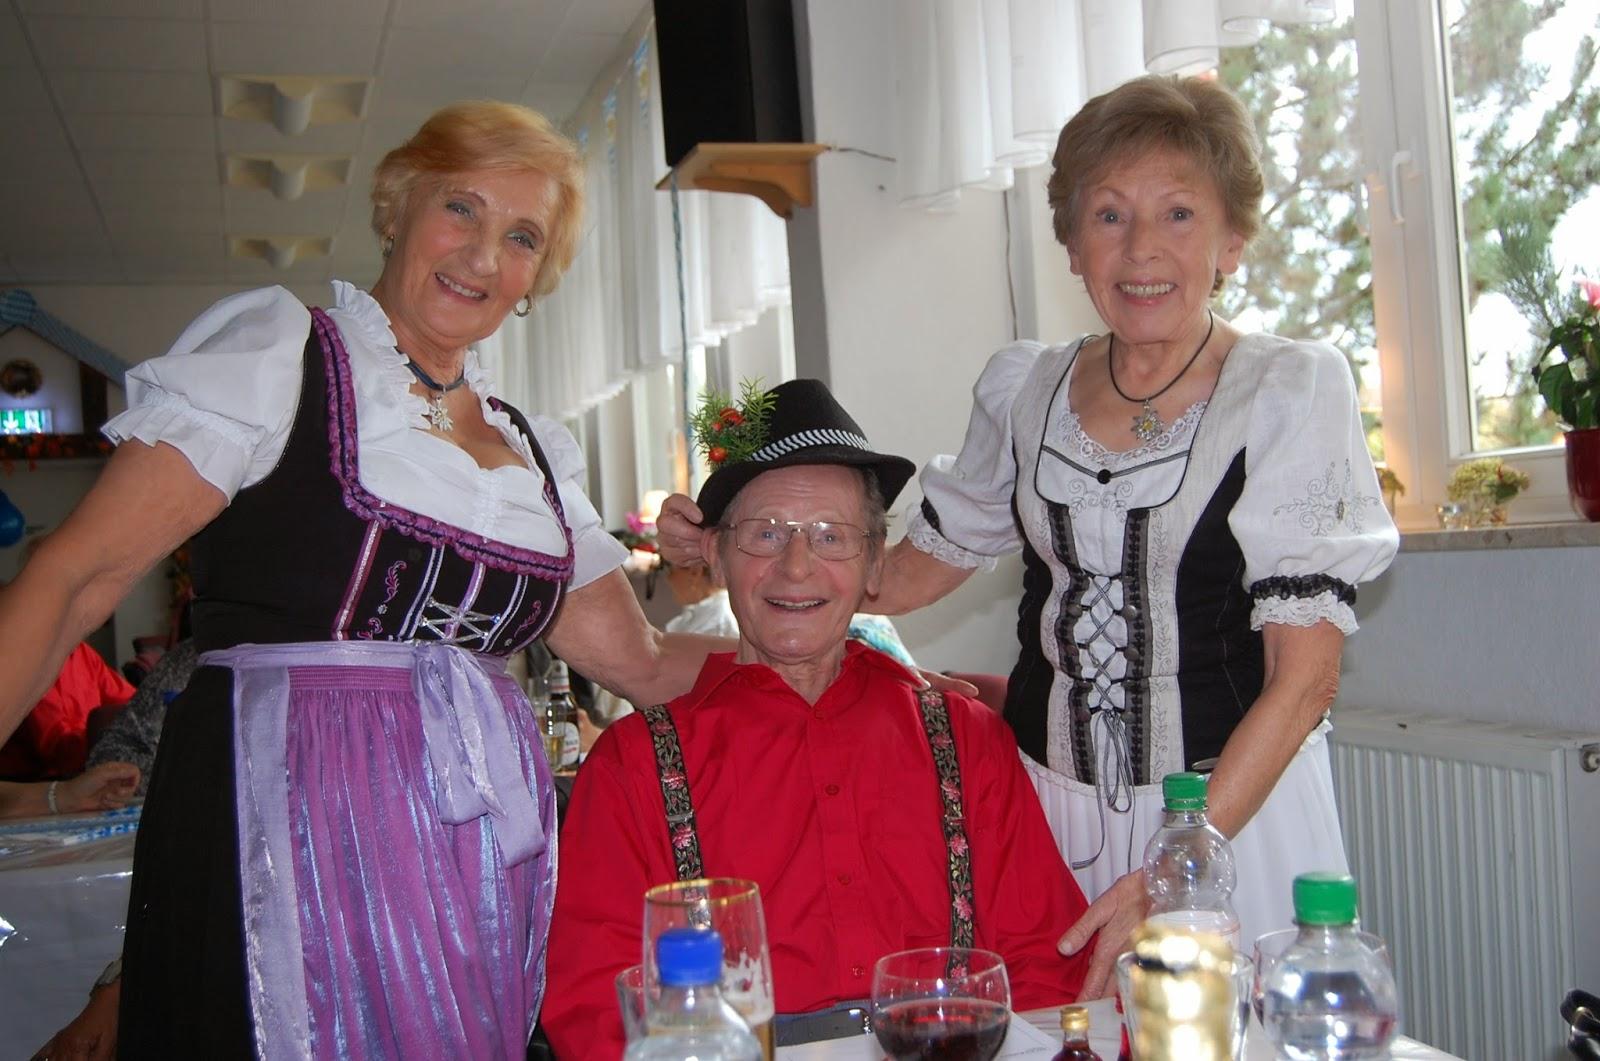 10 14 Seniorentanz Presse 2